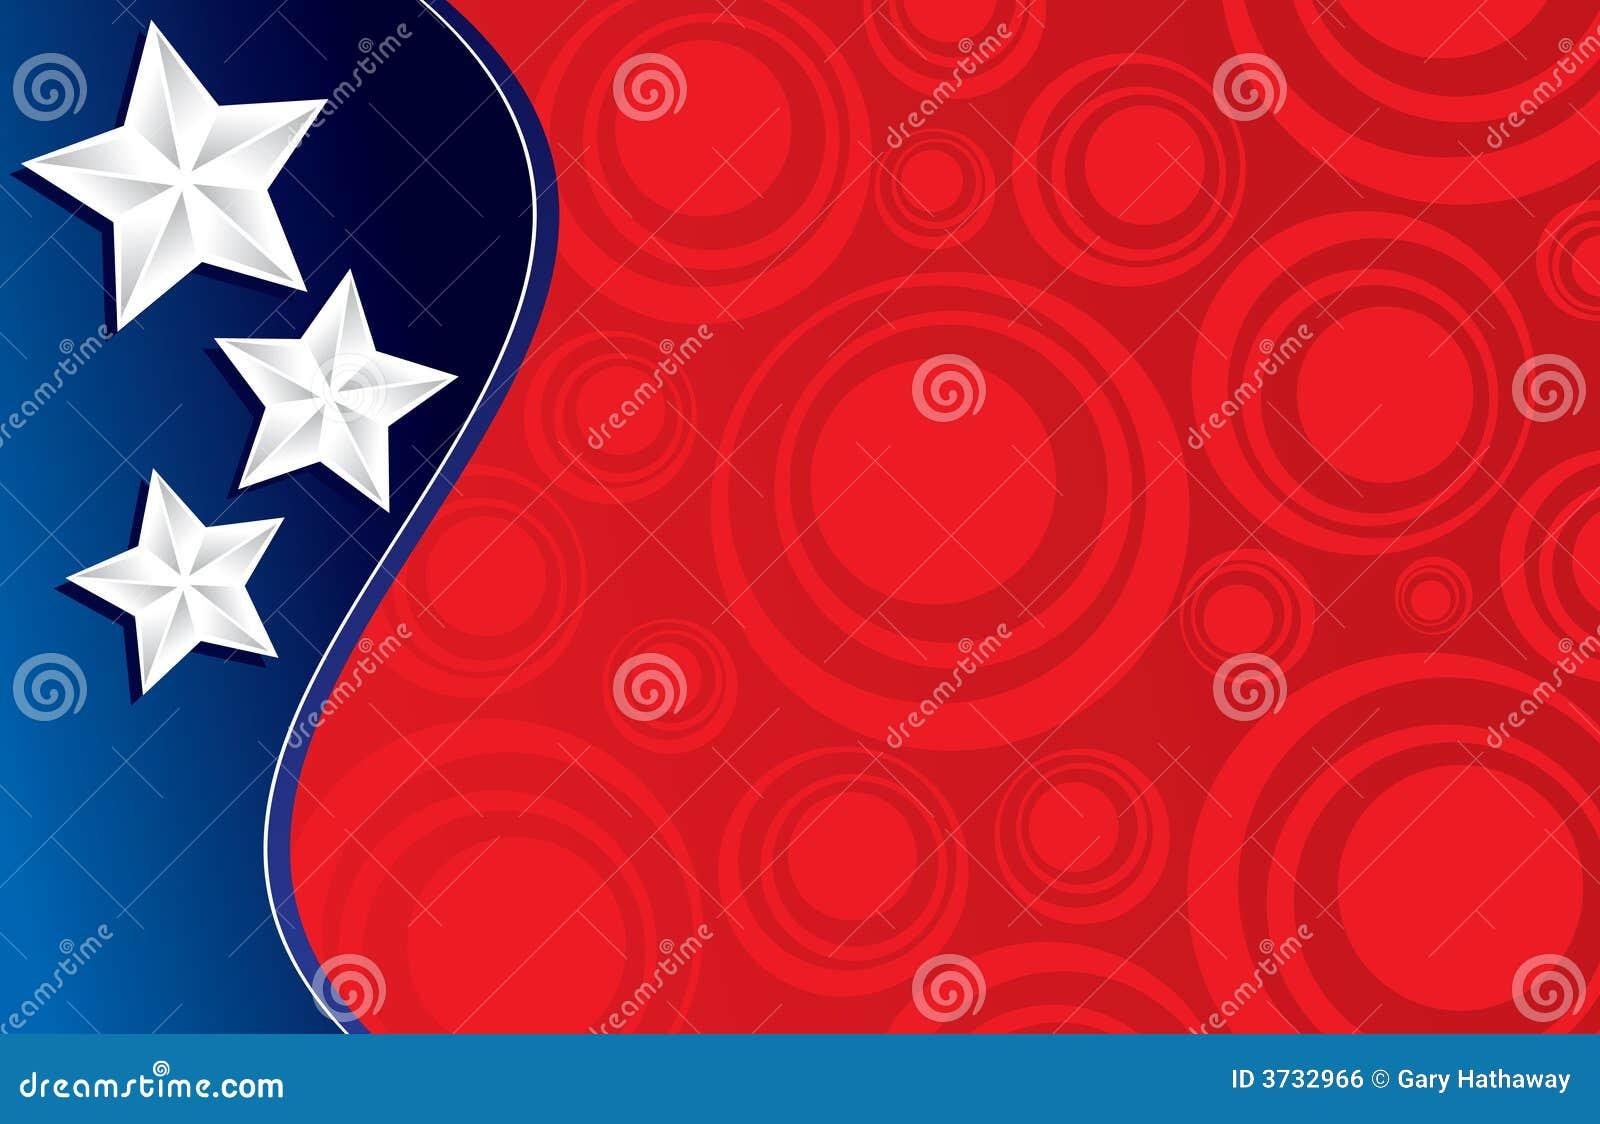 Three stars and circles